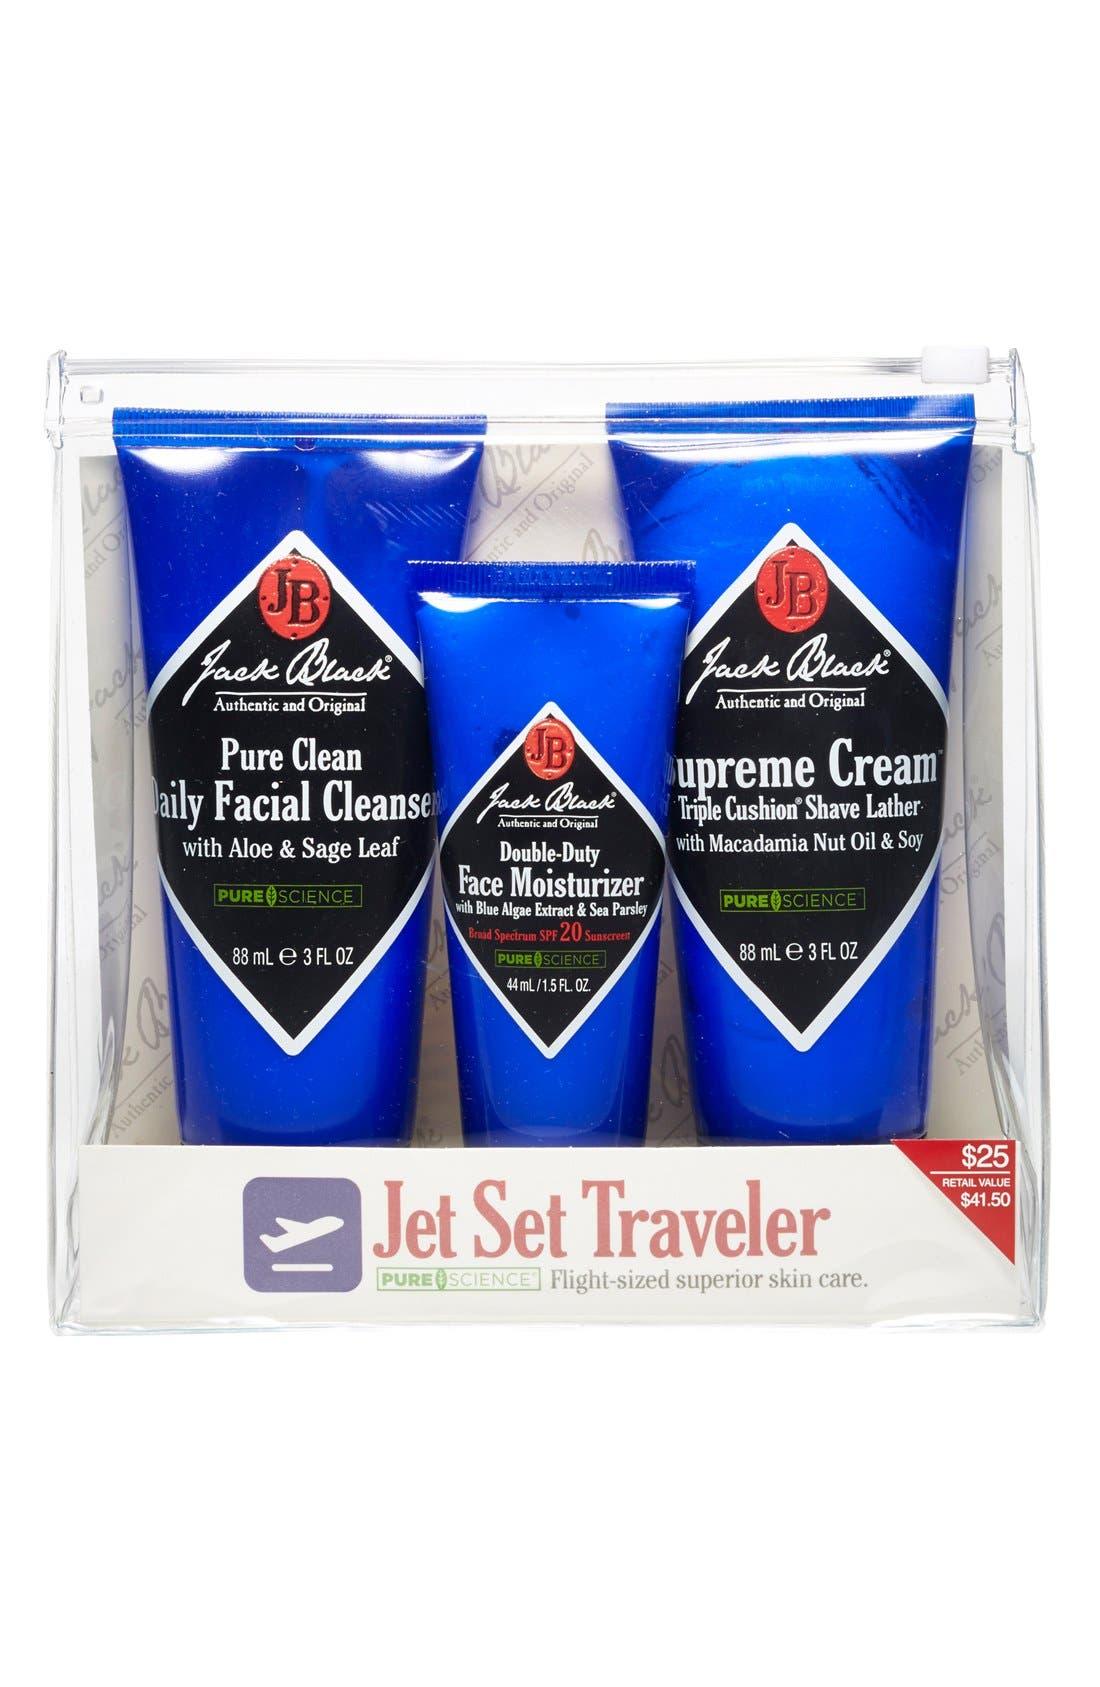 'PureScience<sup>®</sup> Jet Set Traveler' Gift Set,                             Alternate thumbnail 2, color,                             000